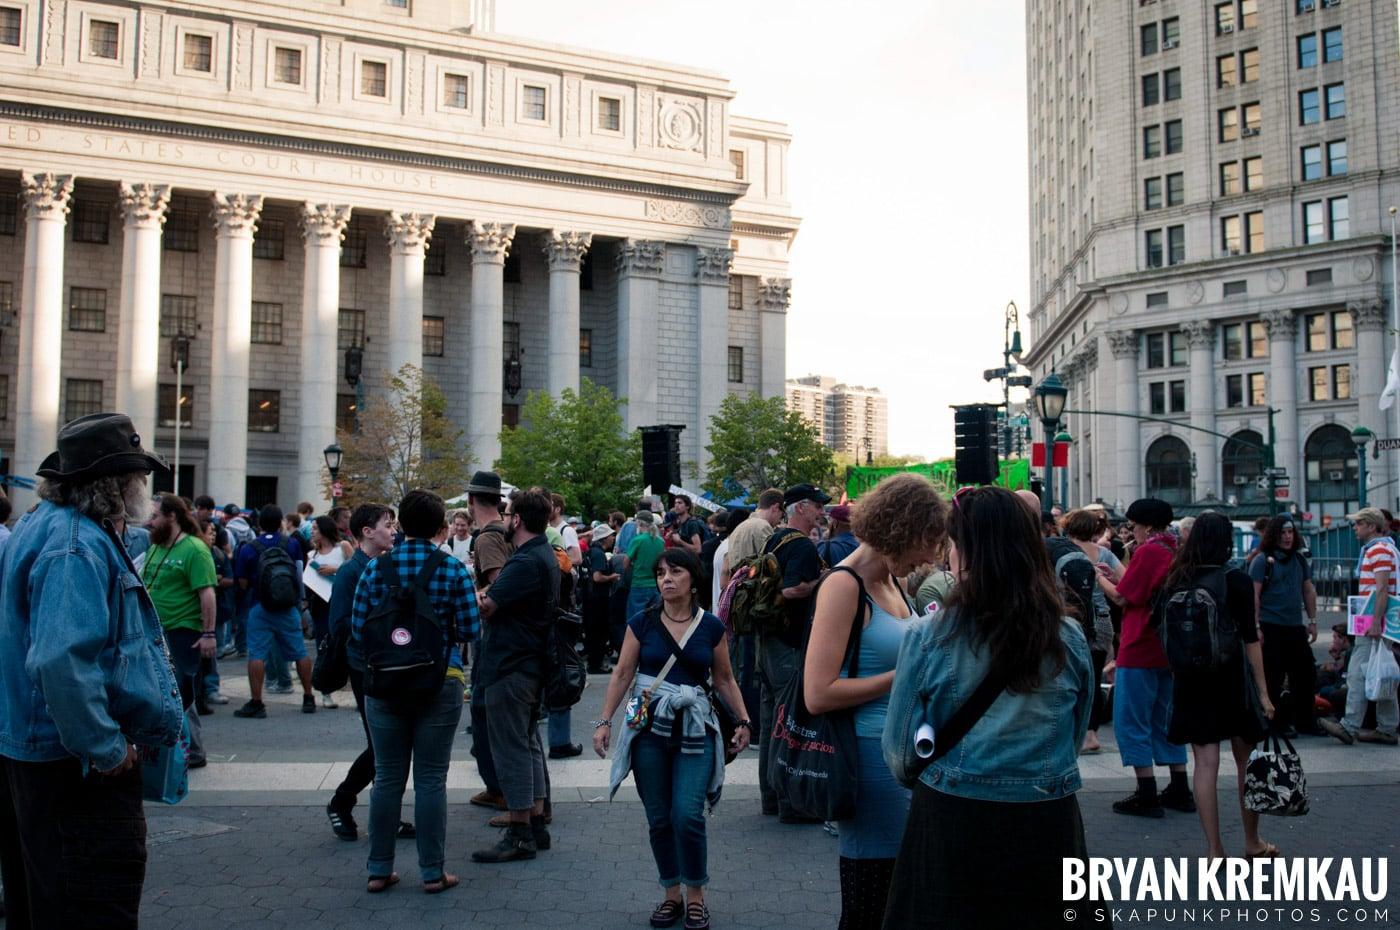 Tom Morello @ Occupy Wall Street Anniversary Concert, Foley Square, NYC - 9.16.12 (1)